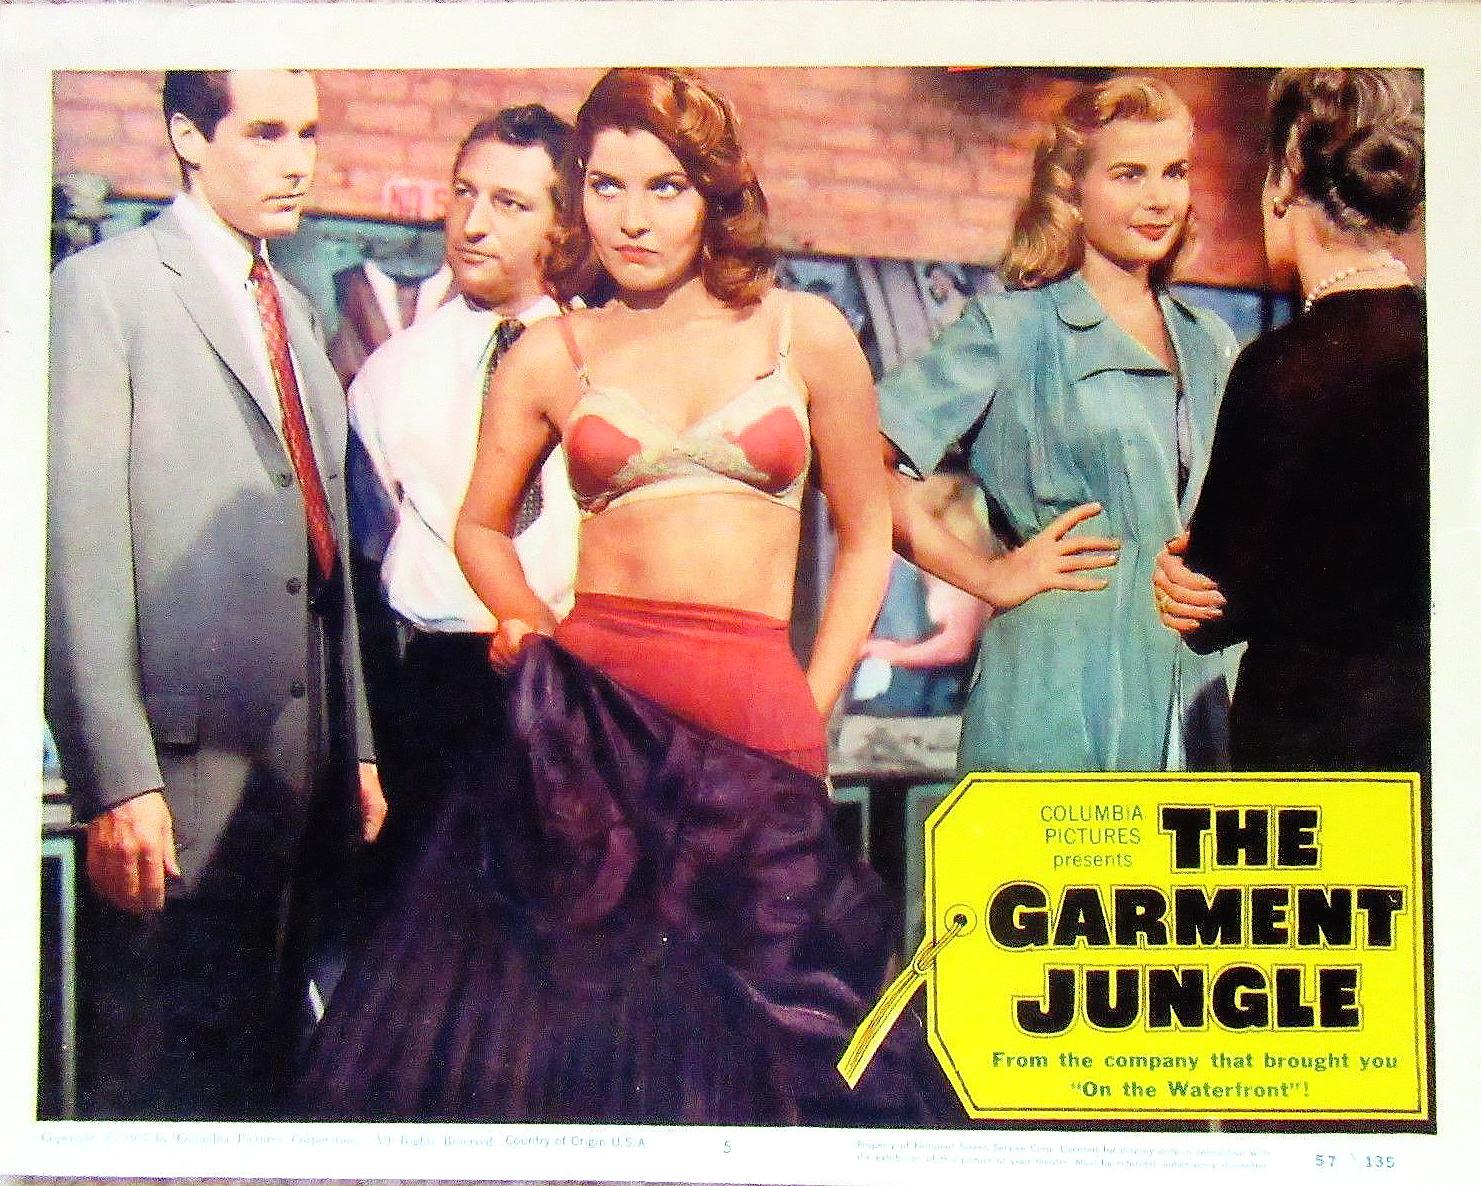 Jann Darlyn, Madelyn Darrow, Joe Lanza, Kerwin Mathews, and Gia Scala in The Garment Jungle (1957)